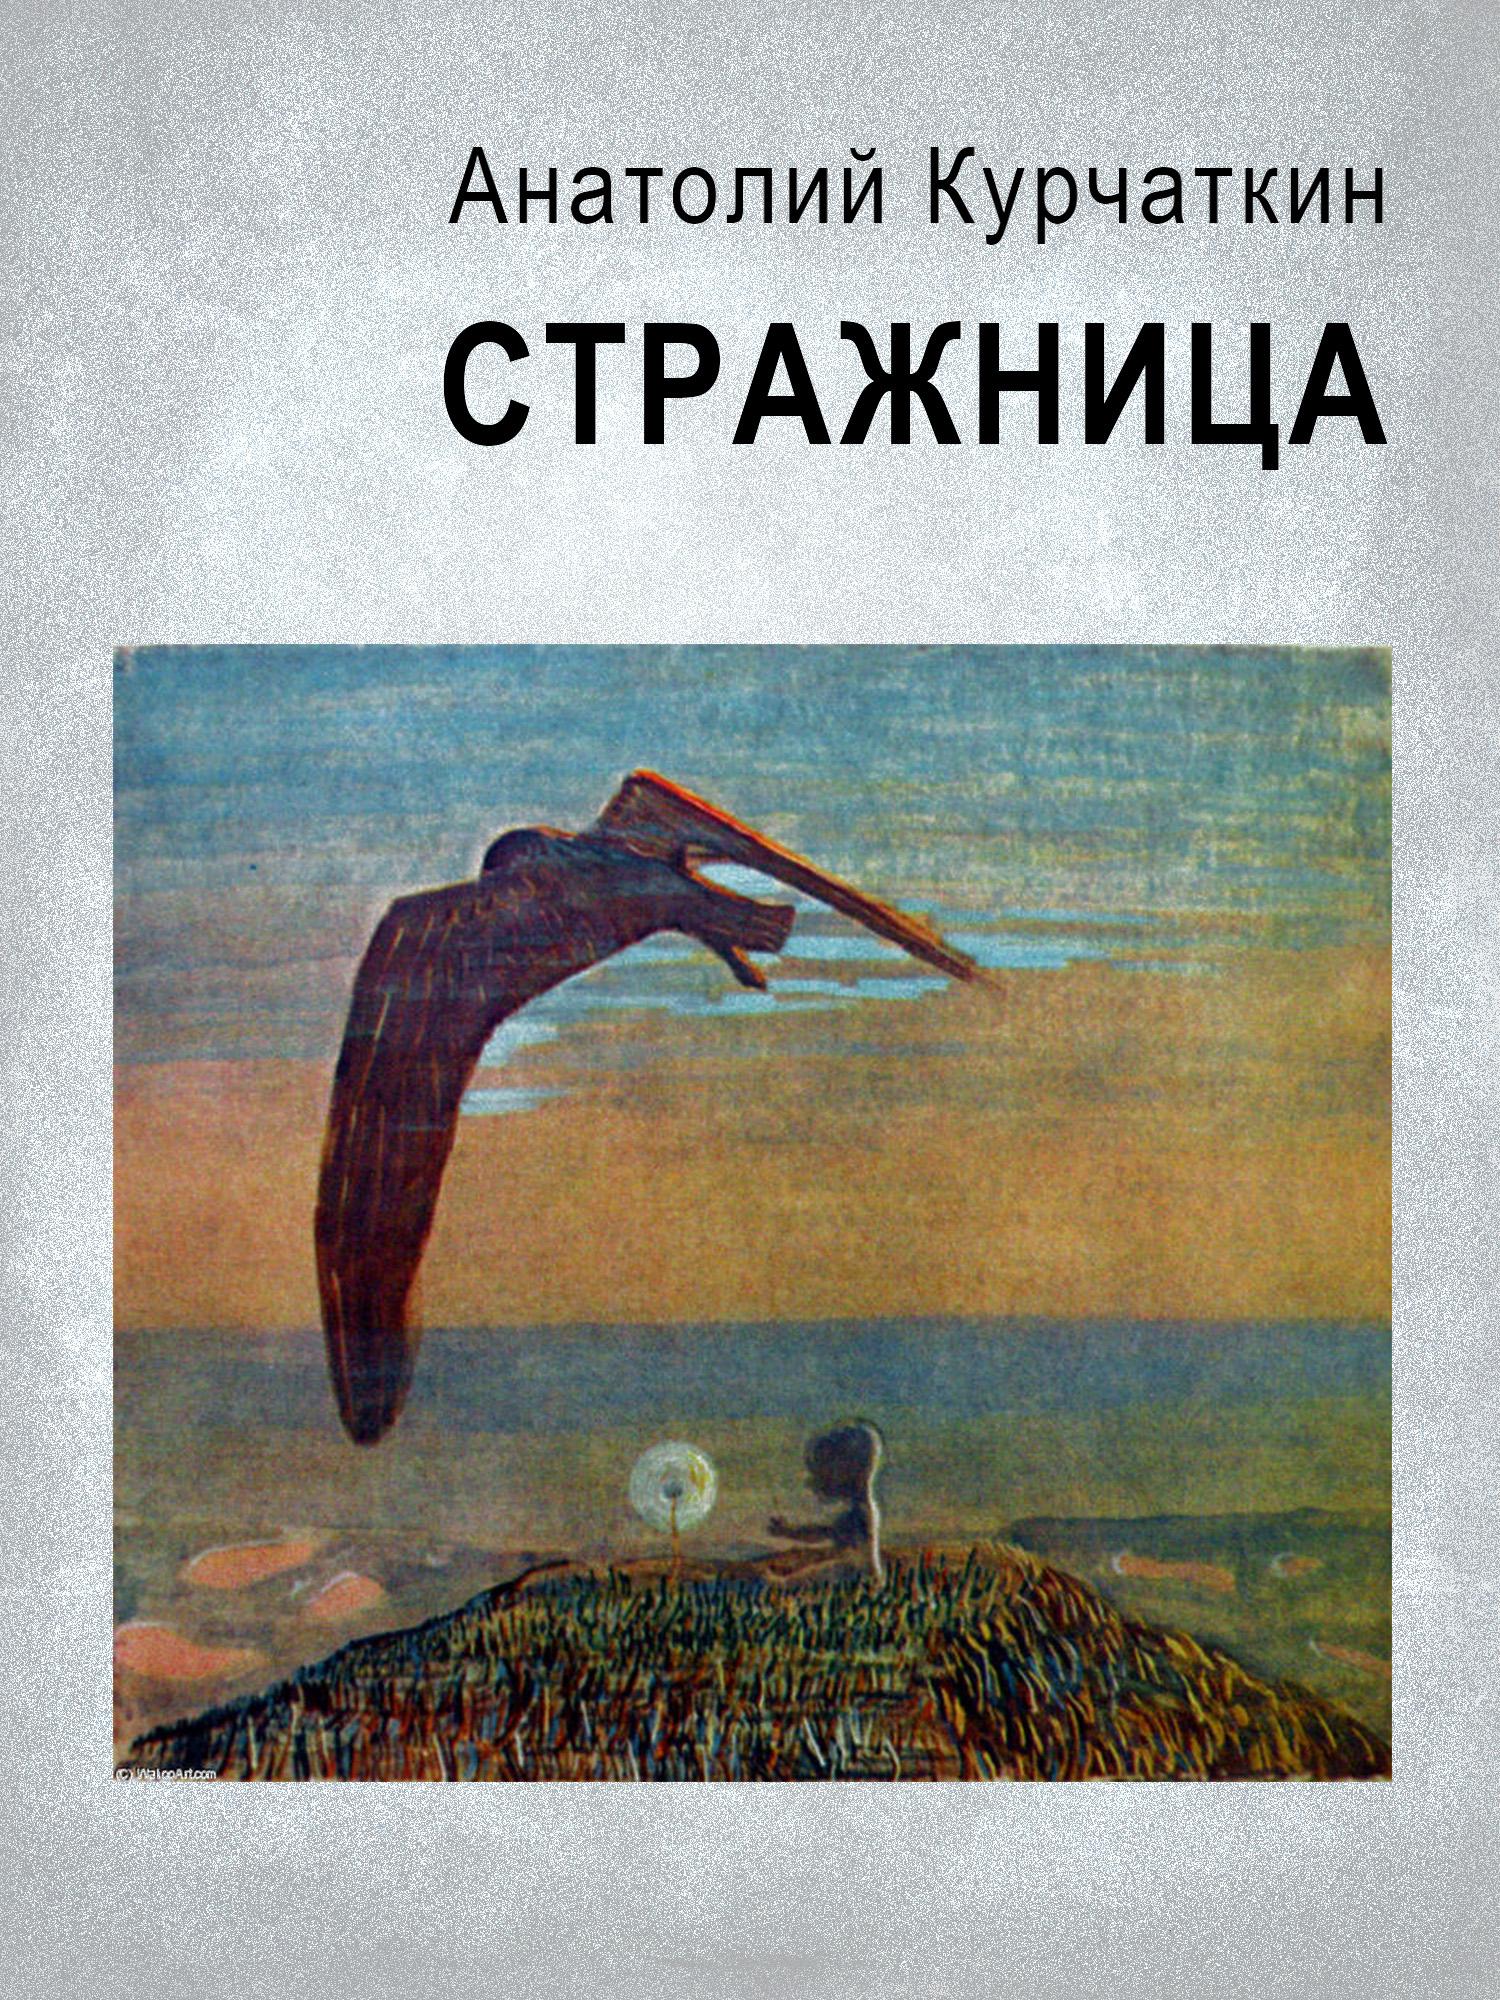 Анатолий Курчаткин Стражница анатолий курчаткин волшебница настя